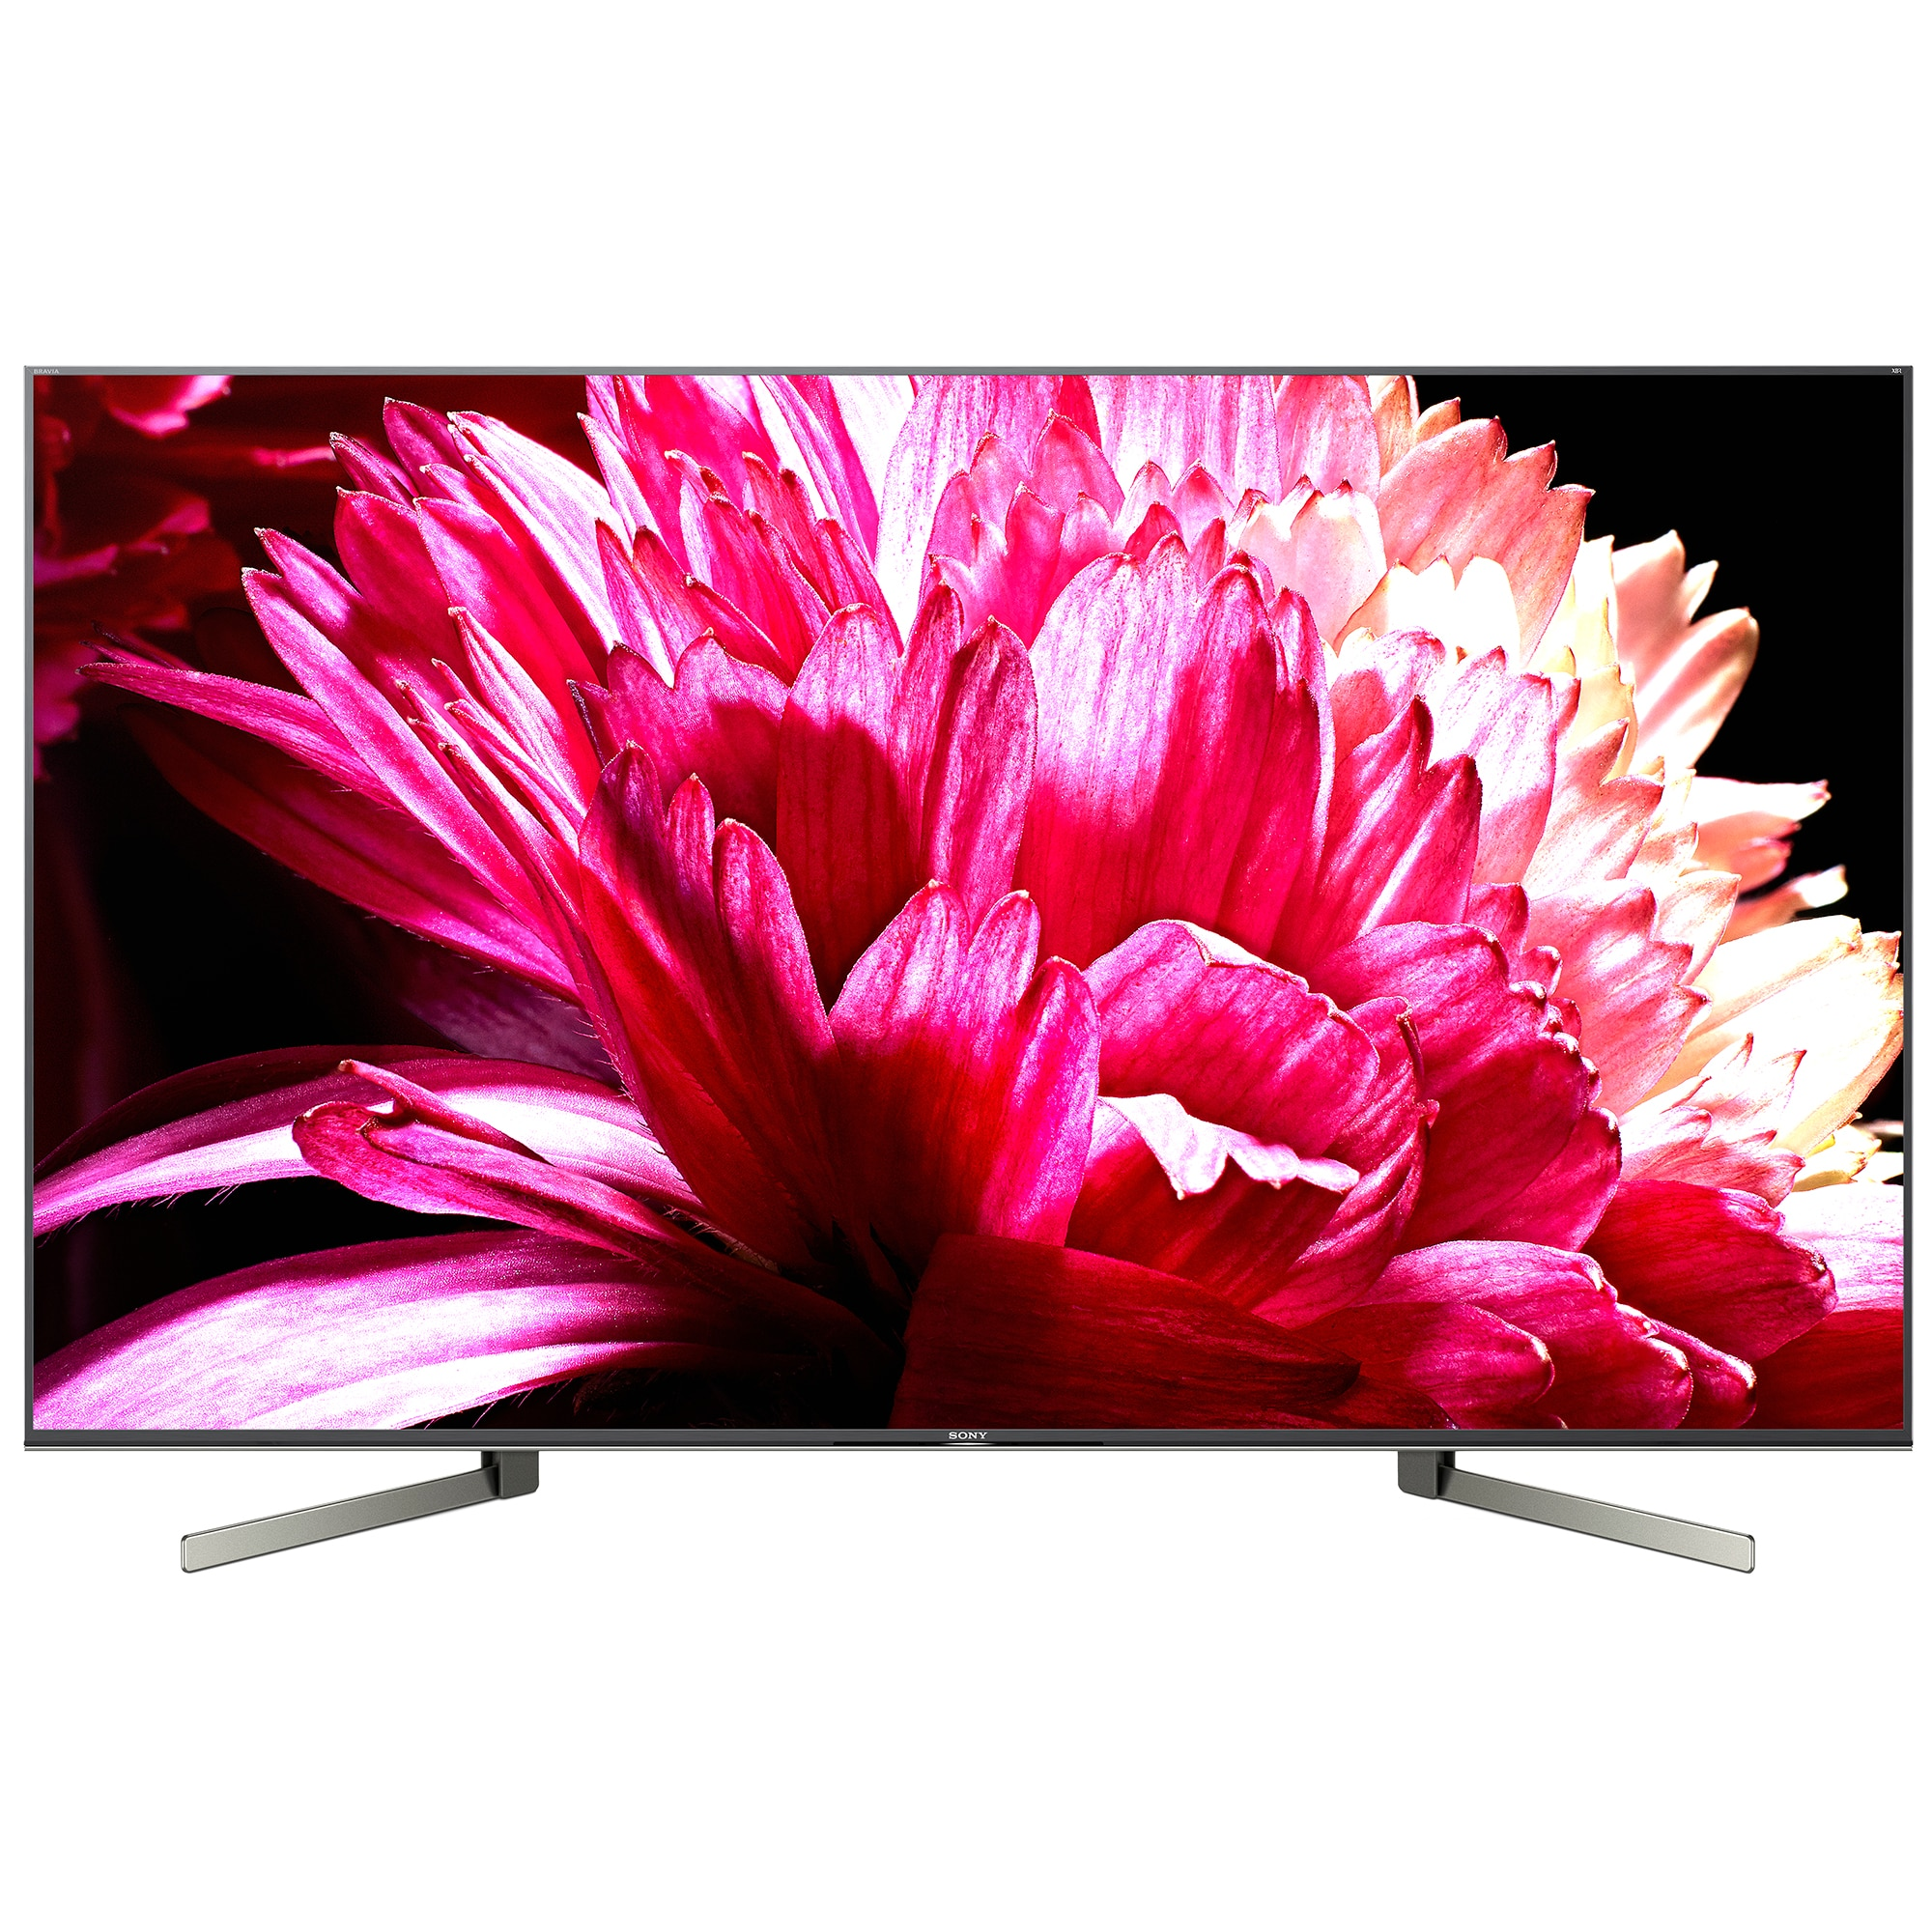 Fotografie Televizor Smart Android LED Sony BRAVIA, 189.3 cm, 75XG9505, 4K Ultra HD